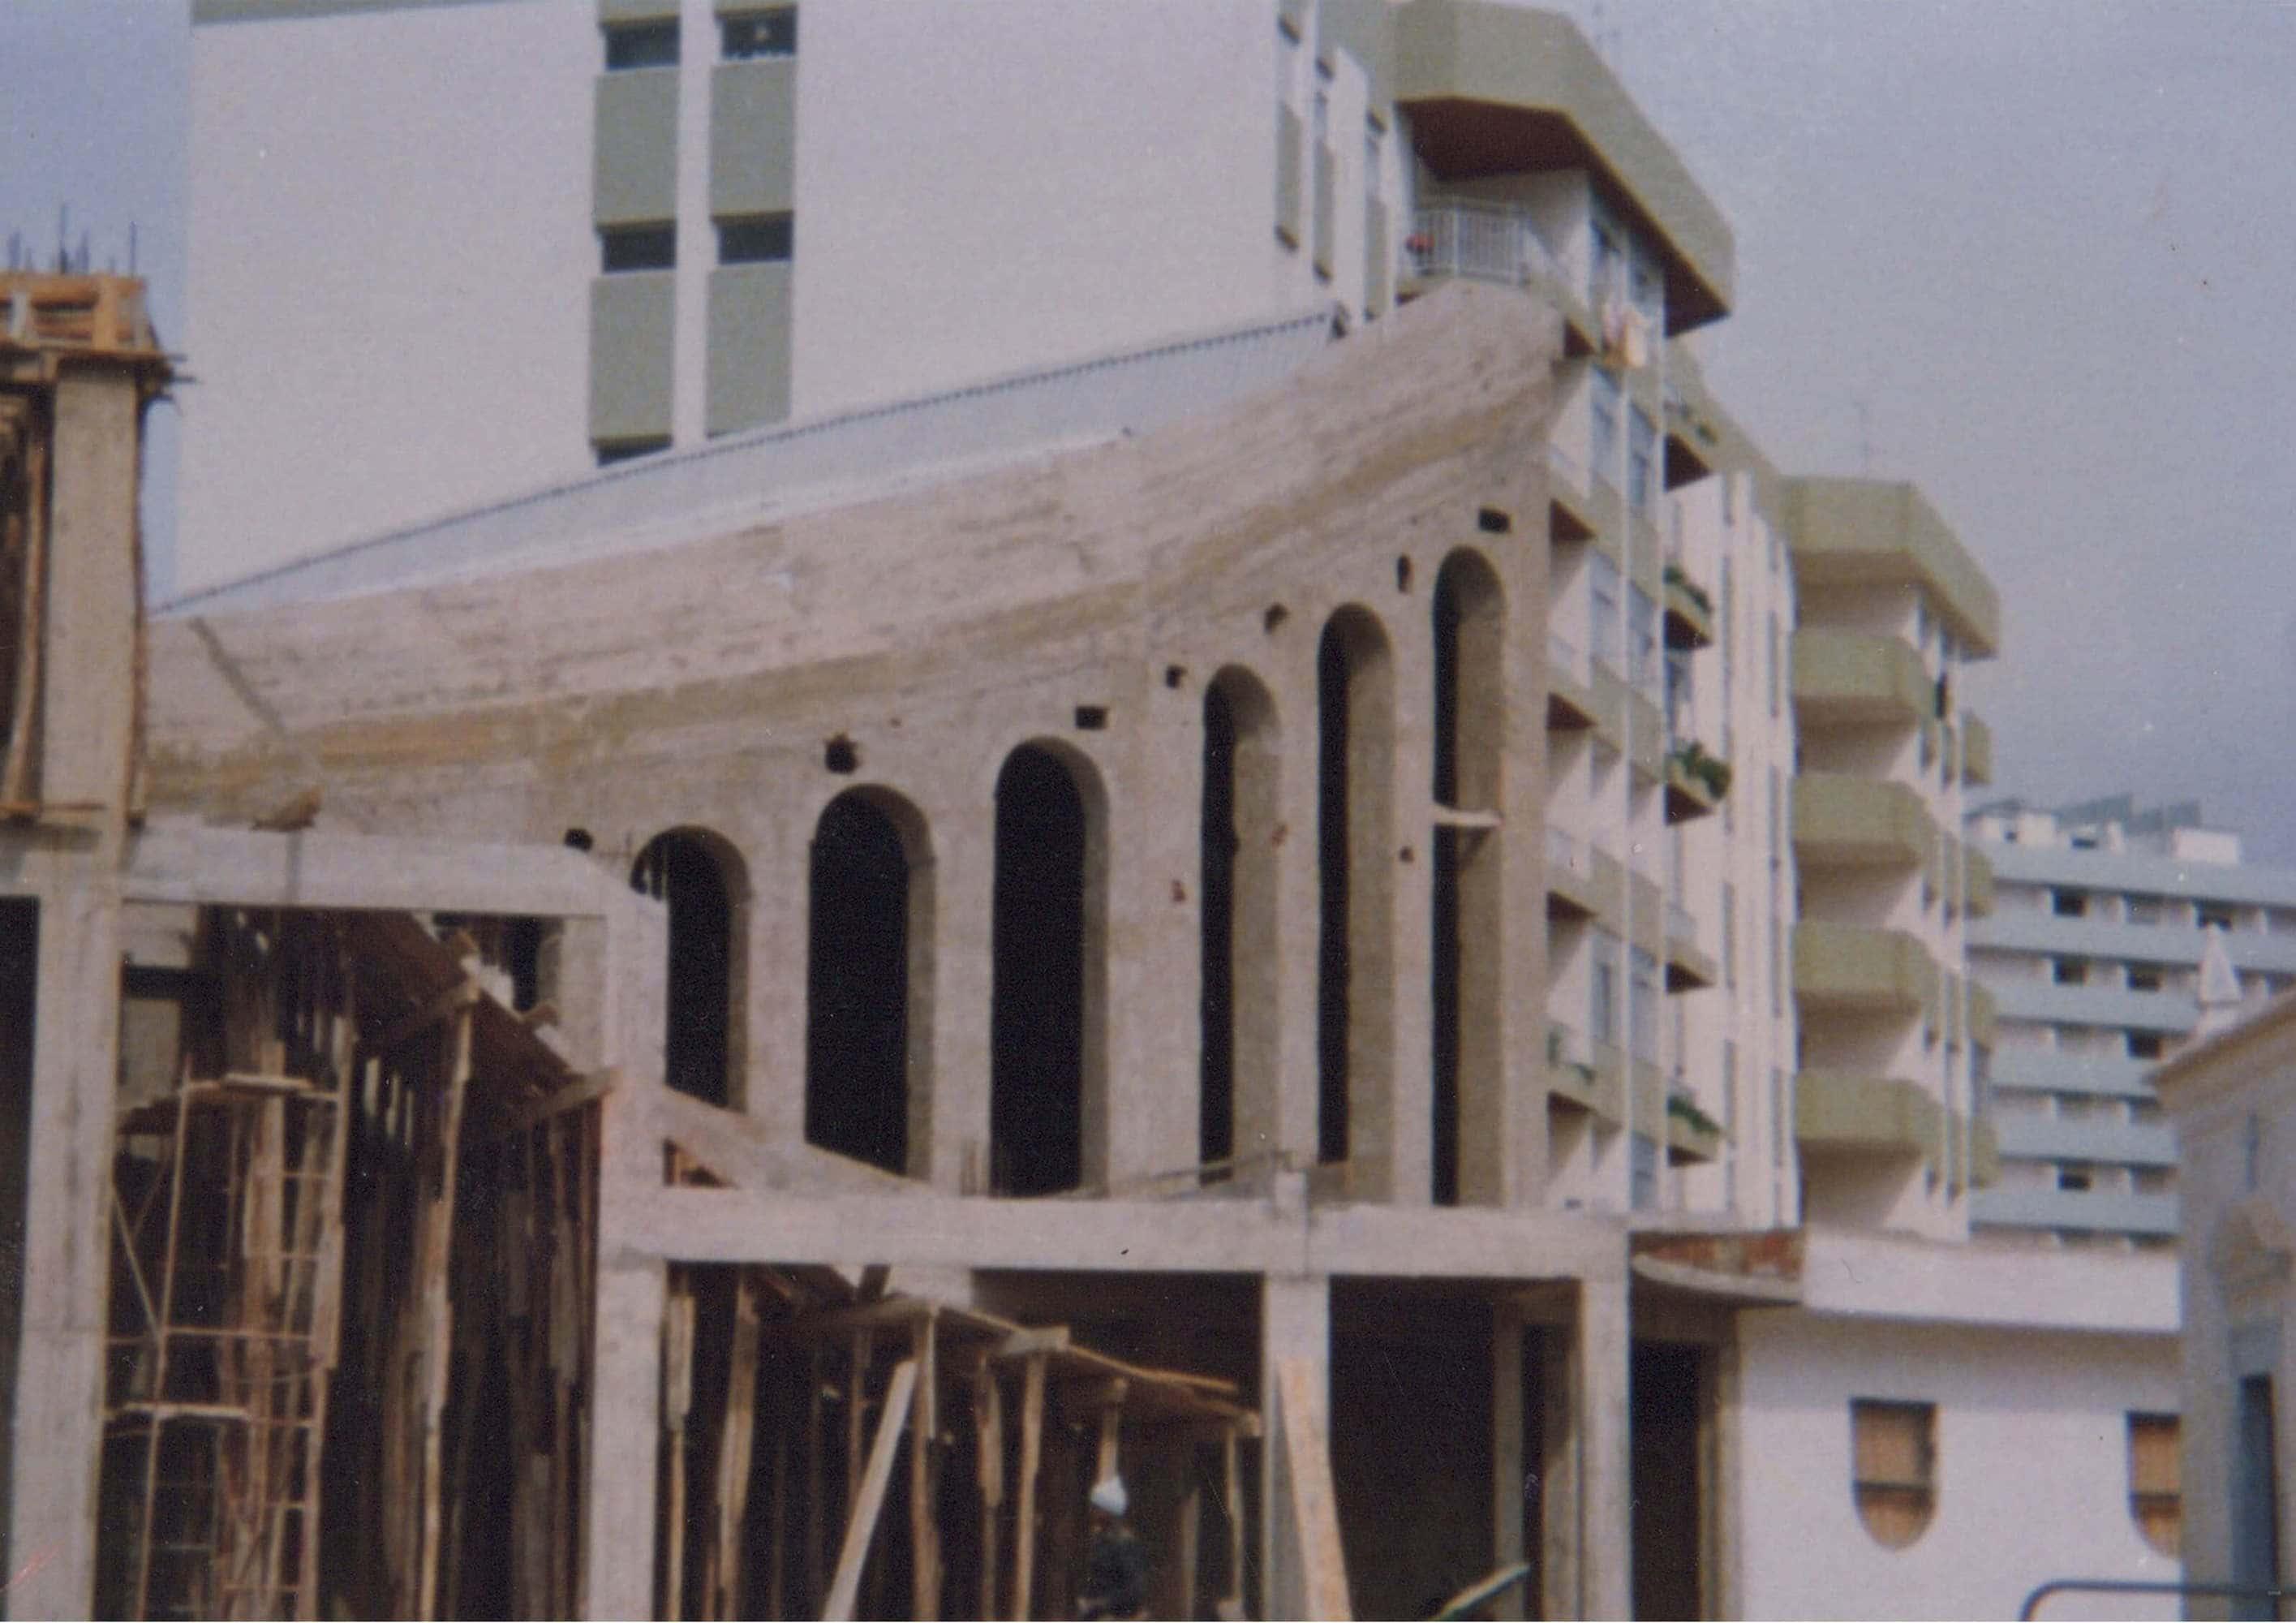 historia-igreja-historia-exterior-da-igreja-em-obras